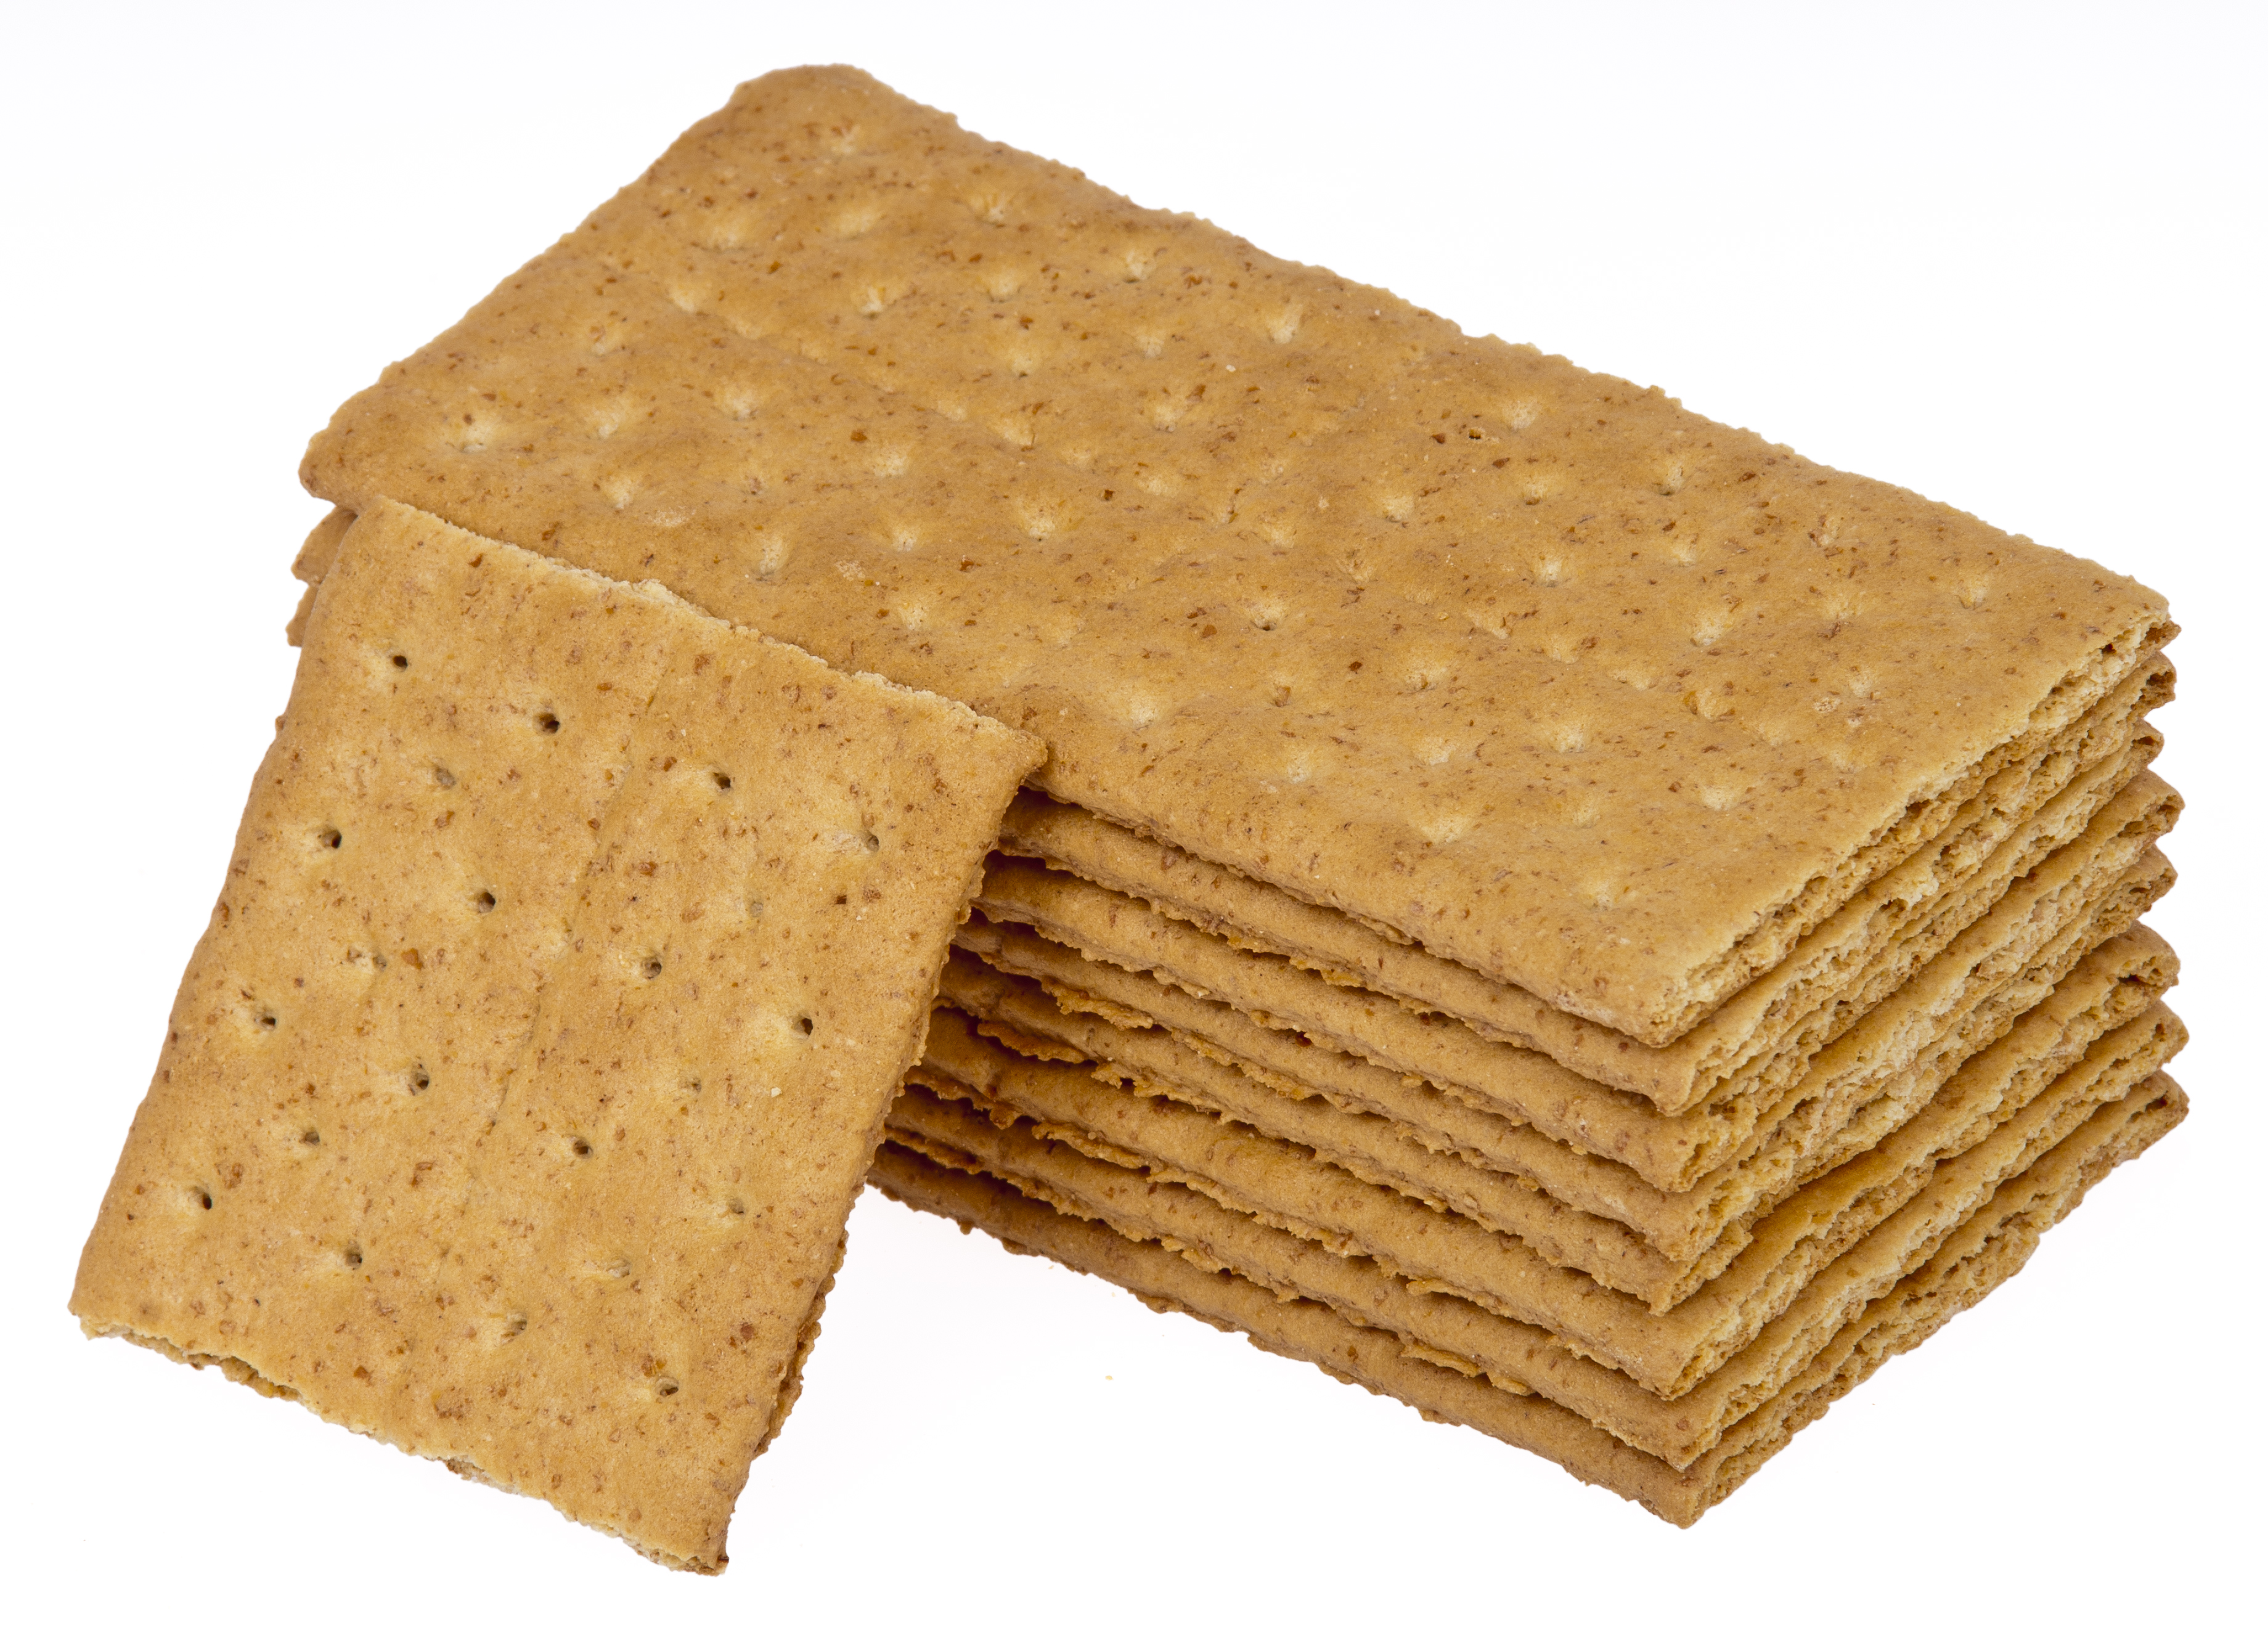 Recipes/Isite_Pics/Graham-Cracker-Stack.jpg